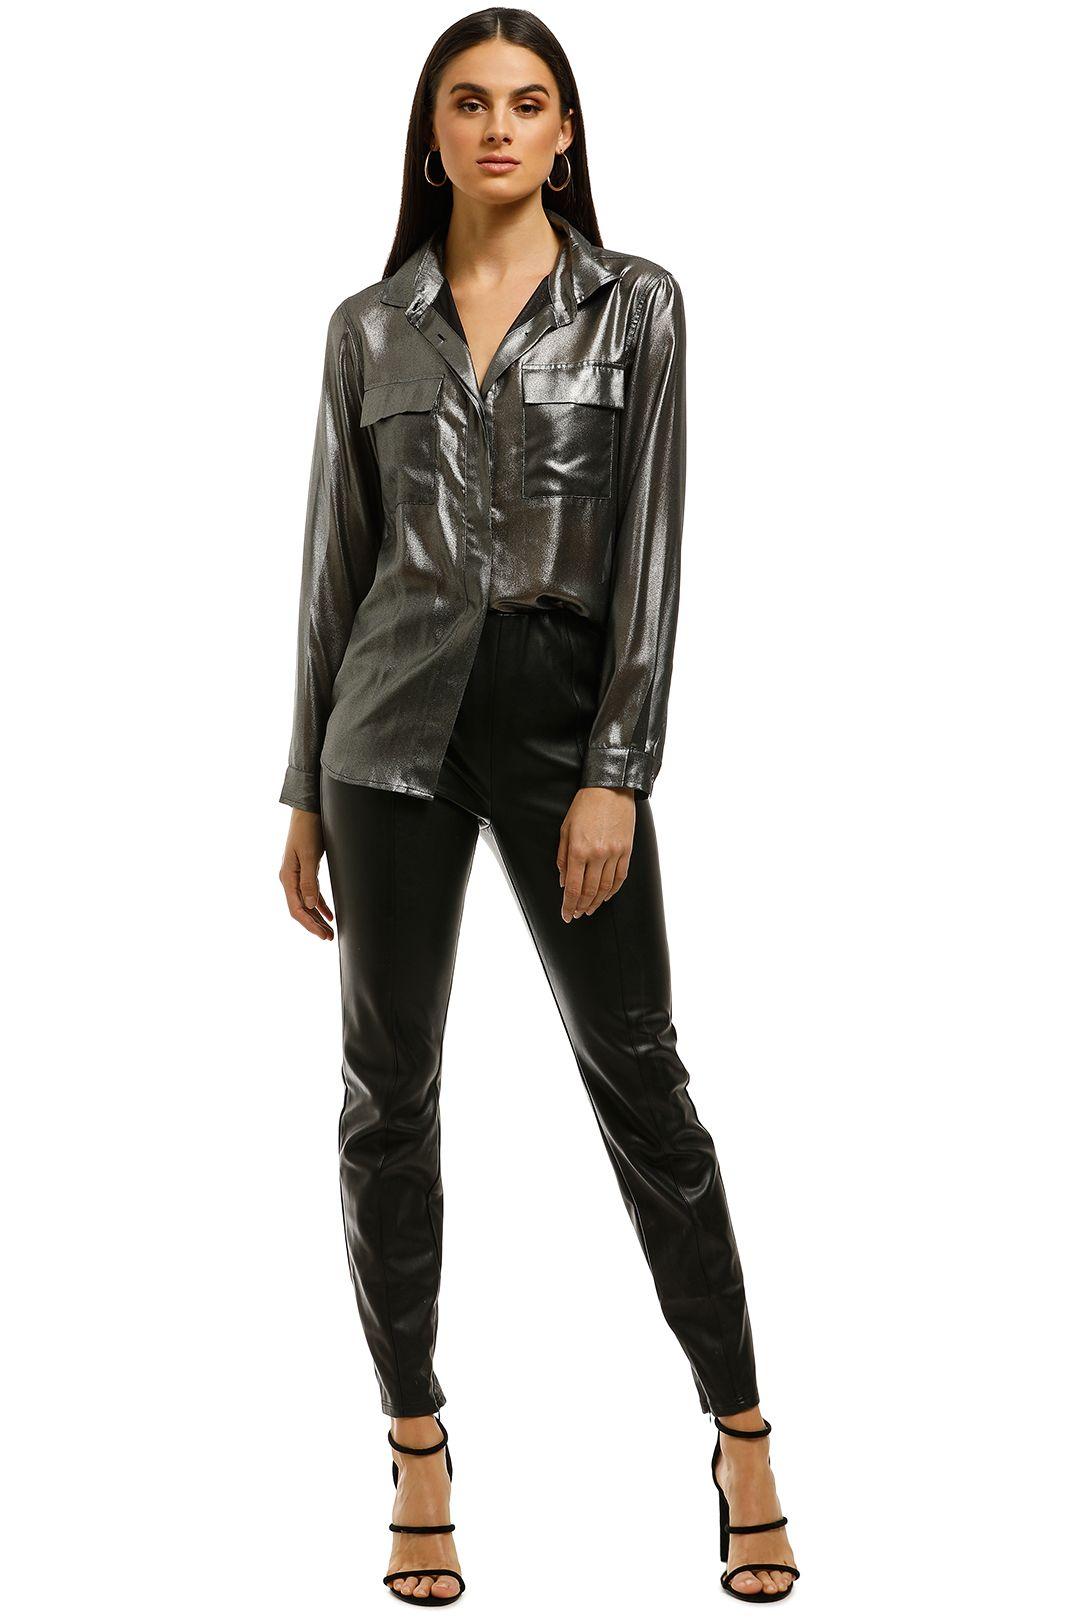 Third-Form-Mirror-Mirror-Shirt-Metallics-Grey-Front